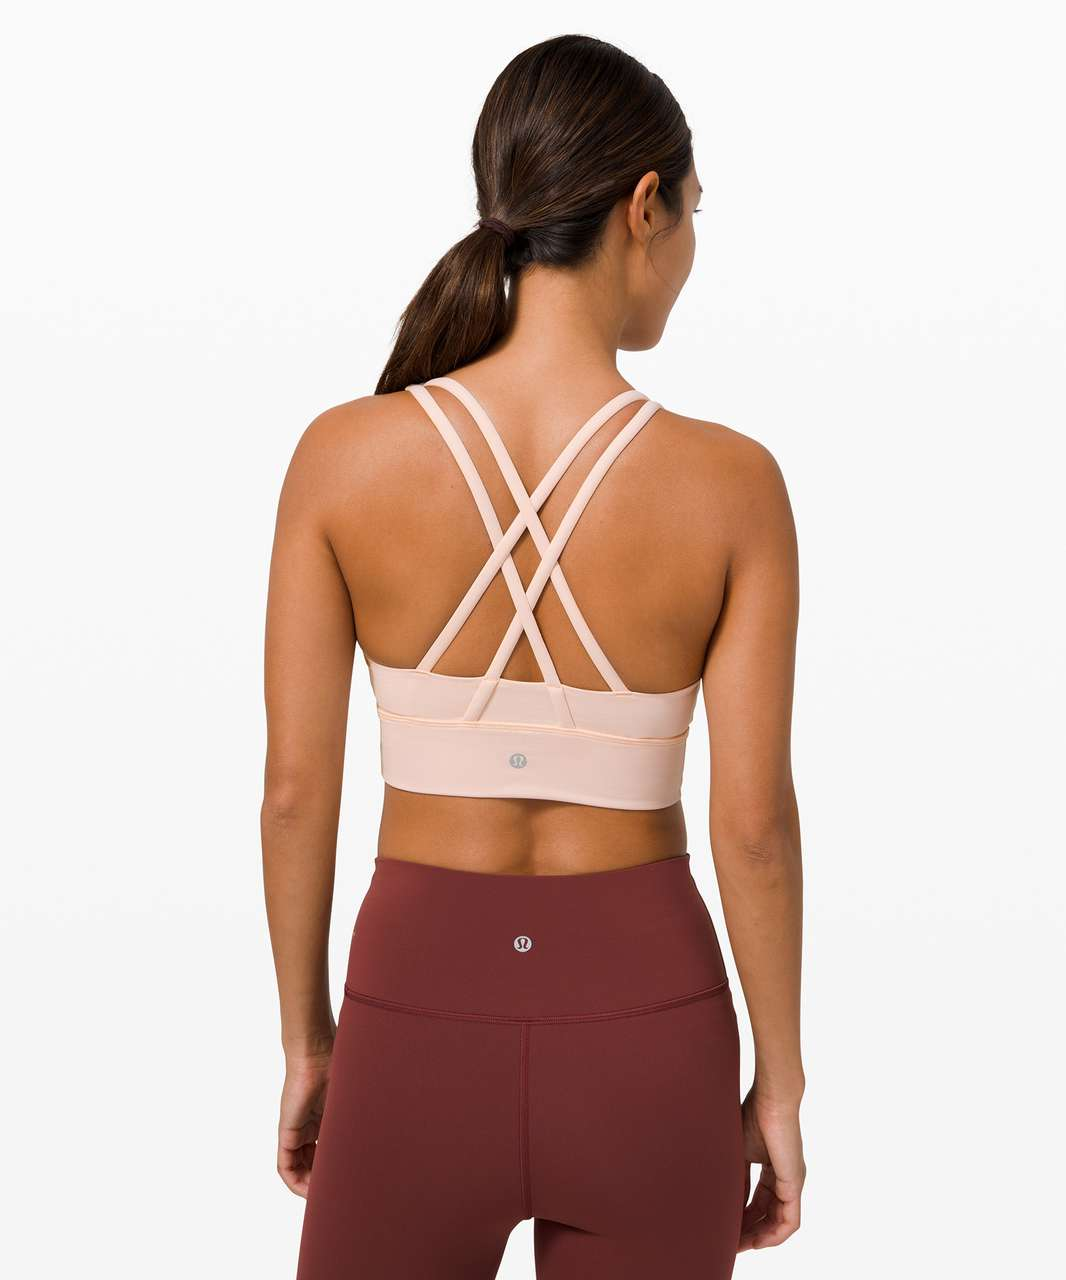 Lululemon Energy Bra Long Line *Medium Support, B–D Cup - Feather Pink